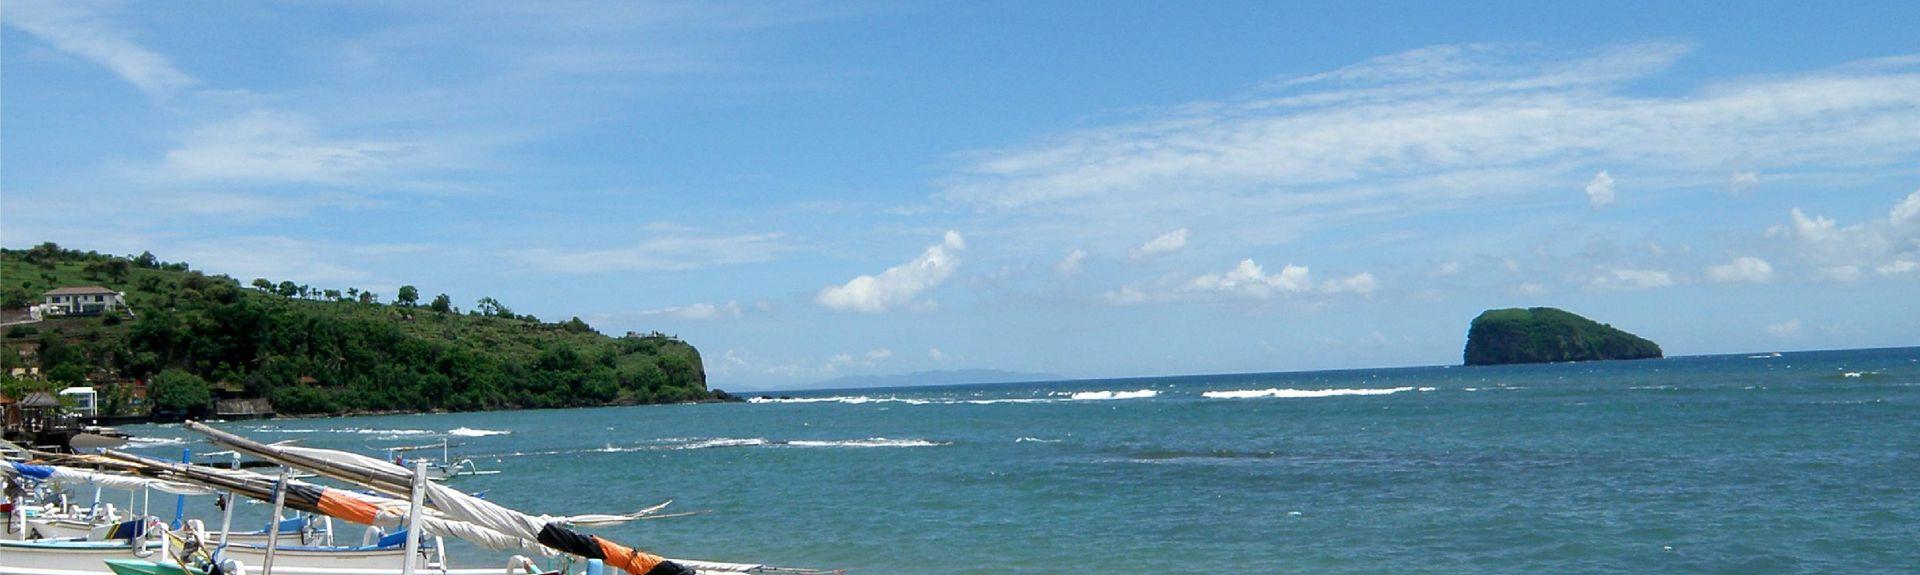 Amed, Amed, Purwakerti, Abang, Karangasem, Karangasem, Bali, Indonesien